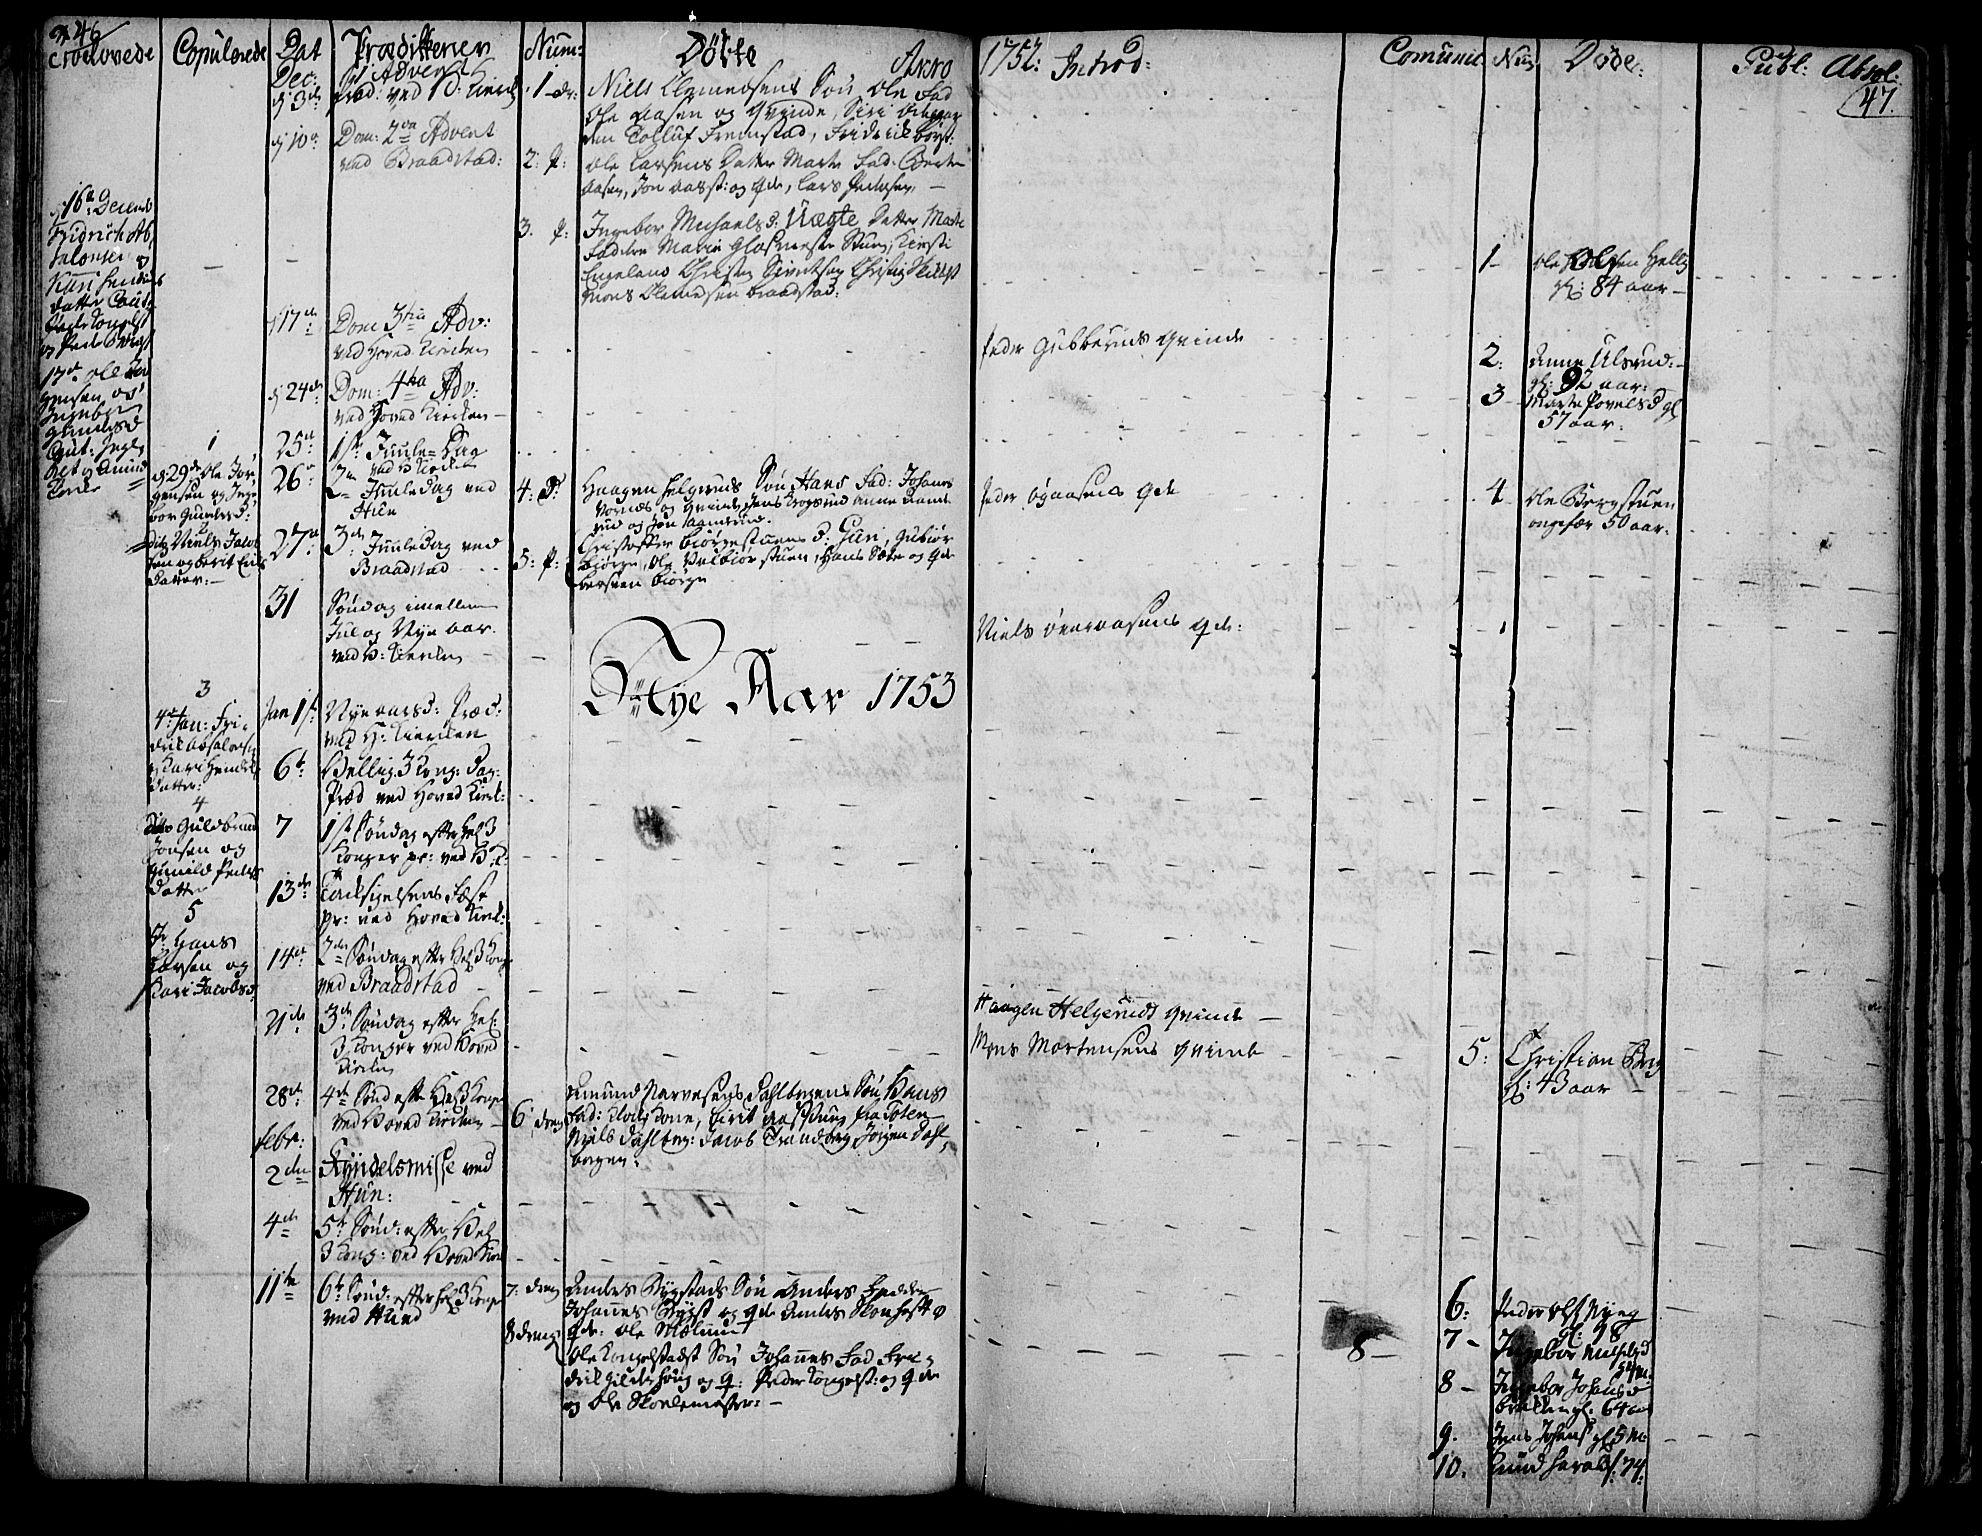 SAH, Vardal prestekontor, H/Ha/Haa/L0002: Ministerialbok nr. 2, 1748-1776, s. 46-47